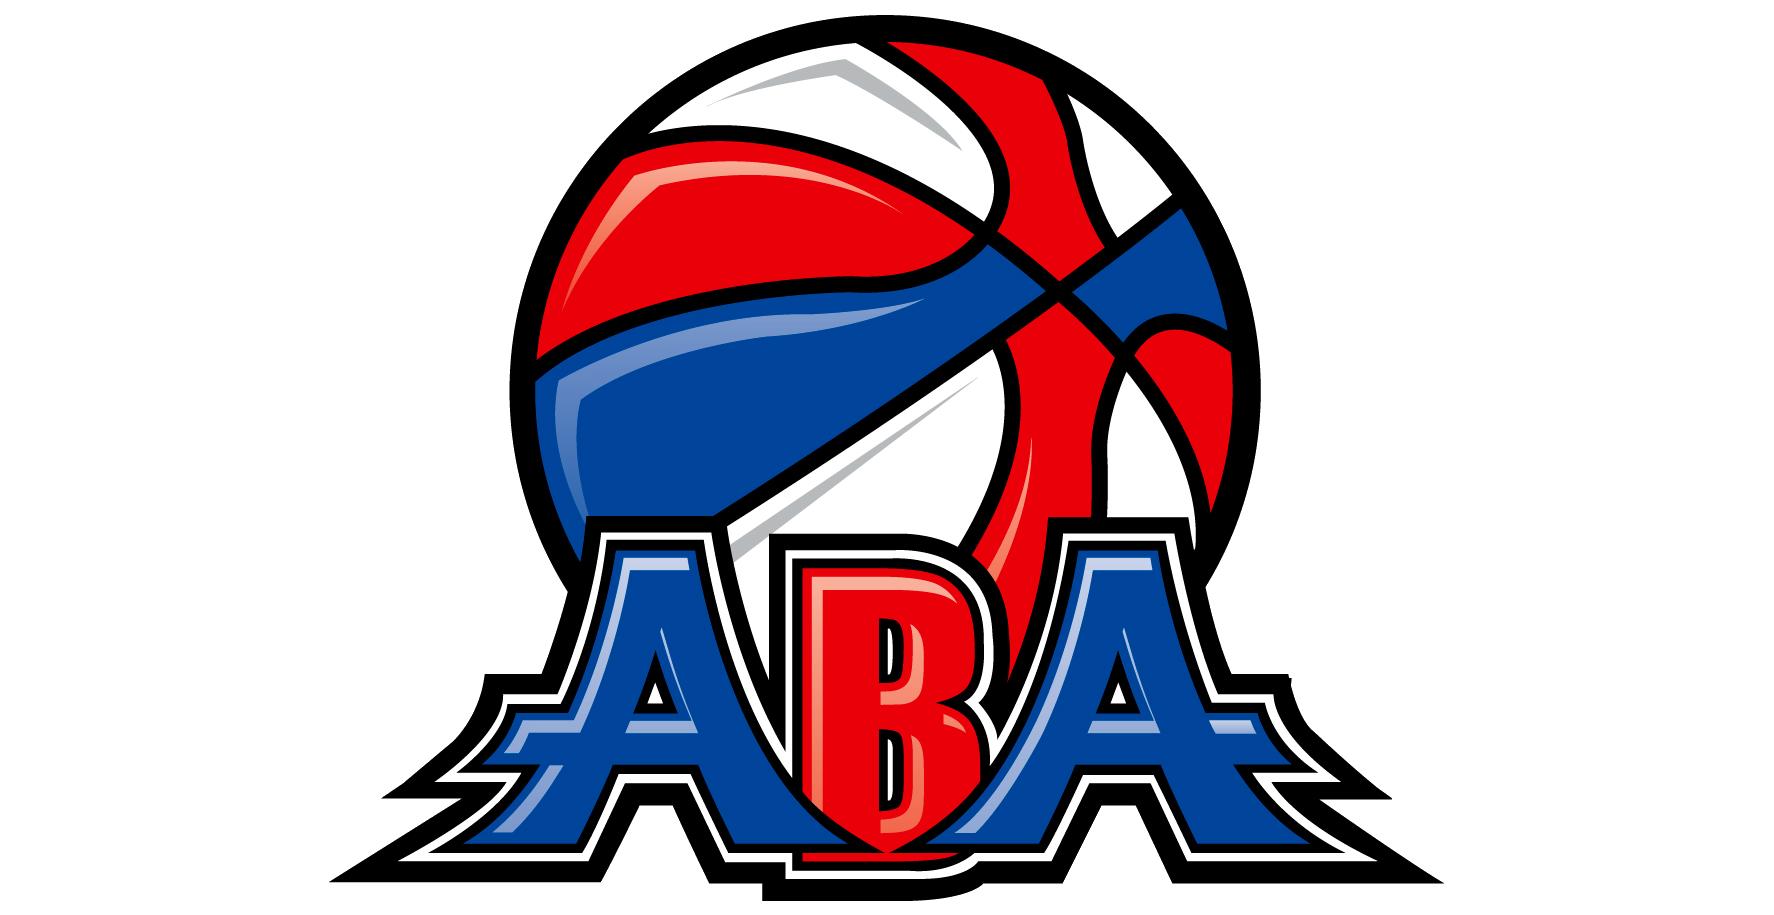 aba logo american basketball assotiation symbol meaning